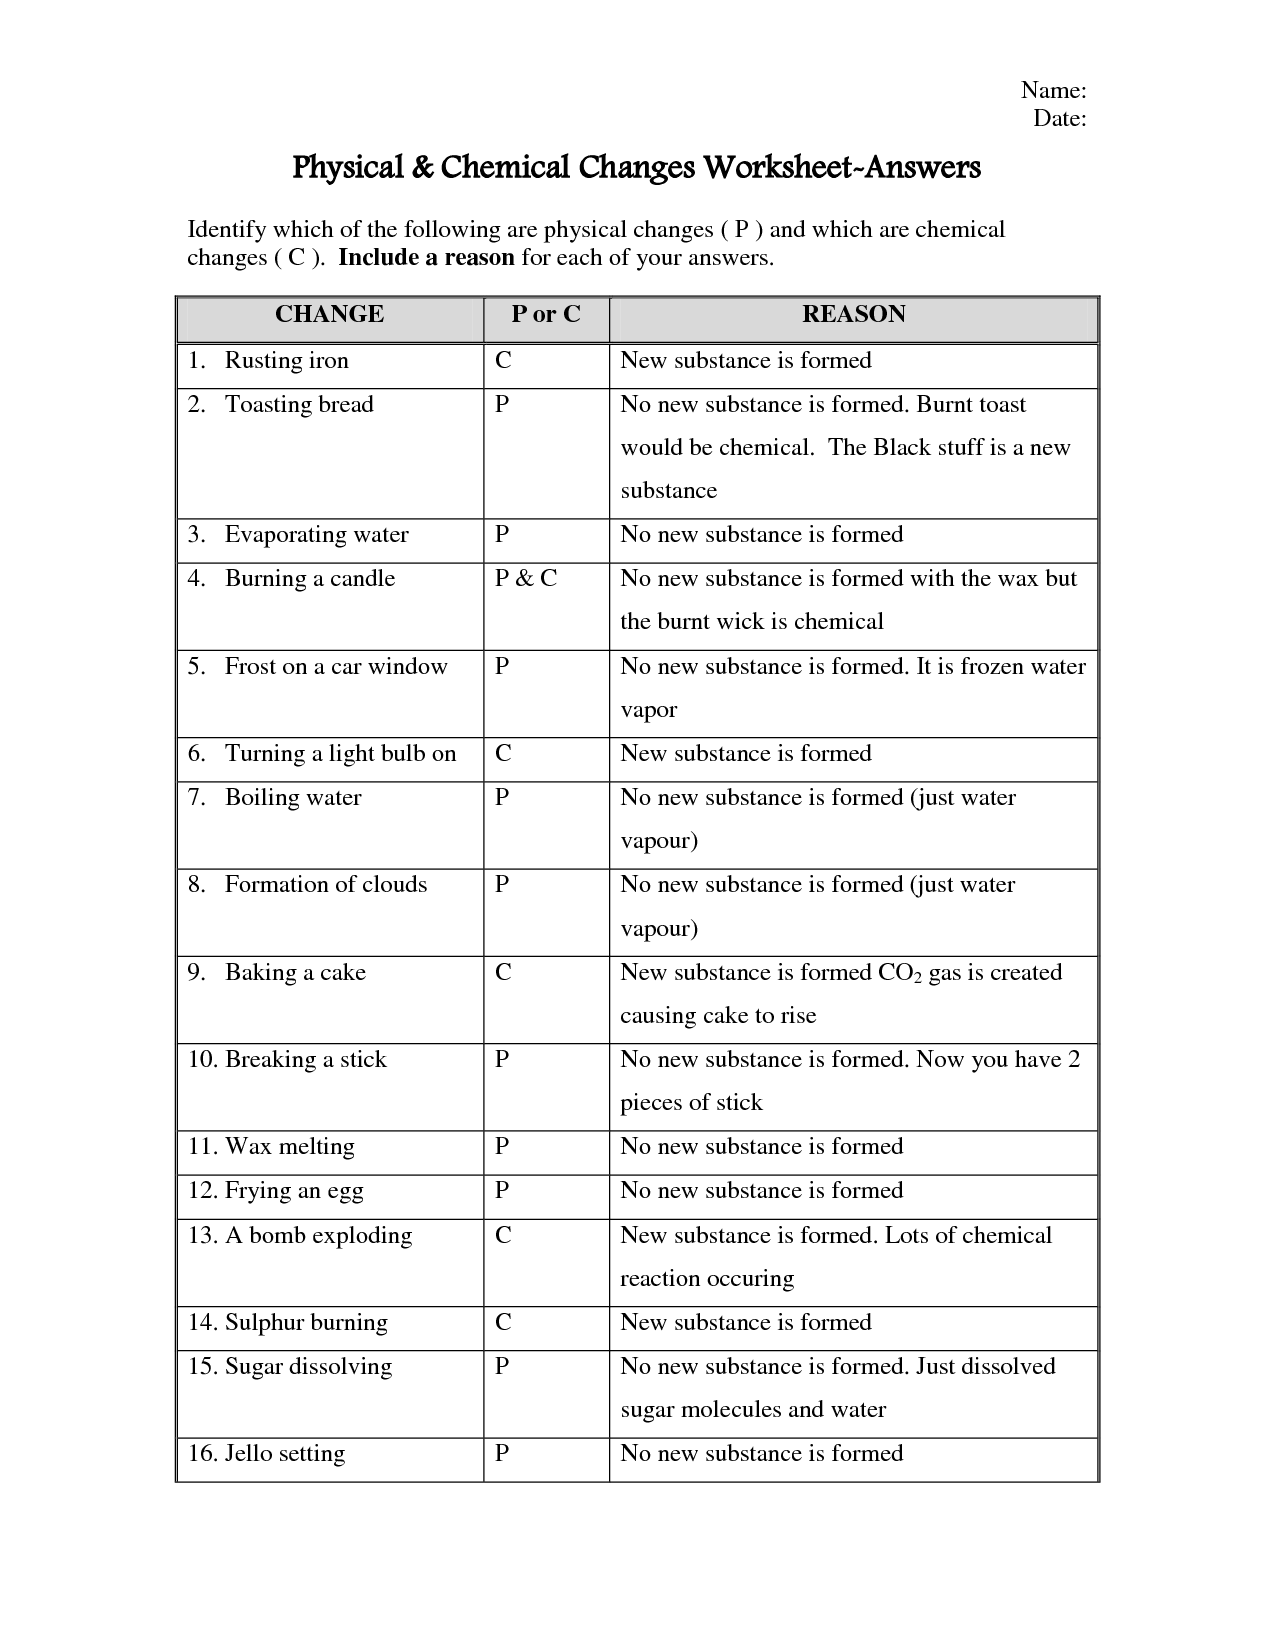 Physical Change Vs Chemical Change Worksheet